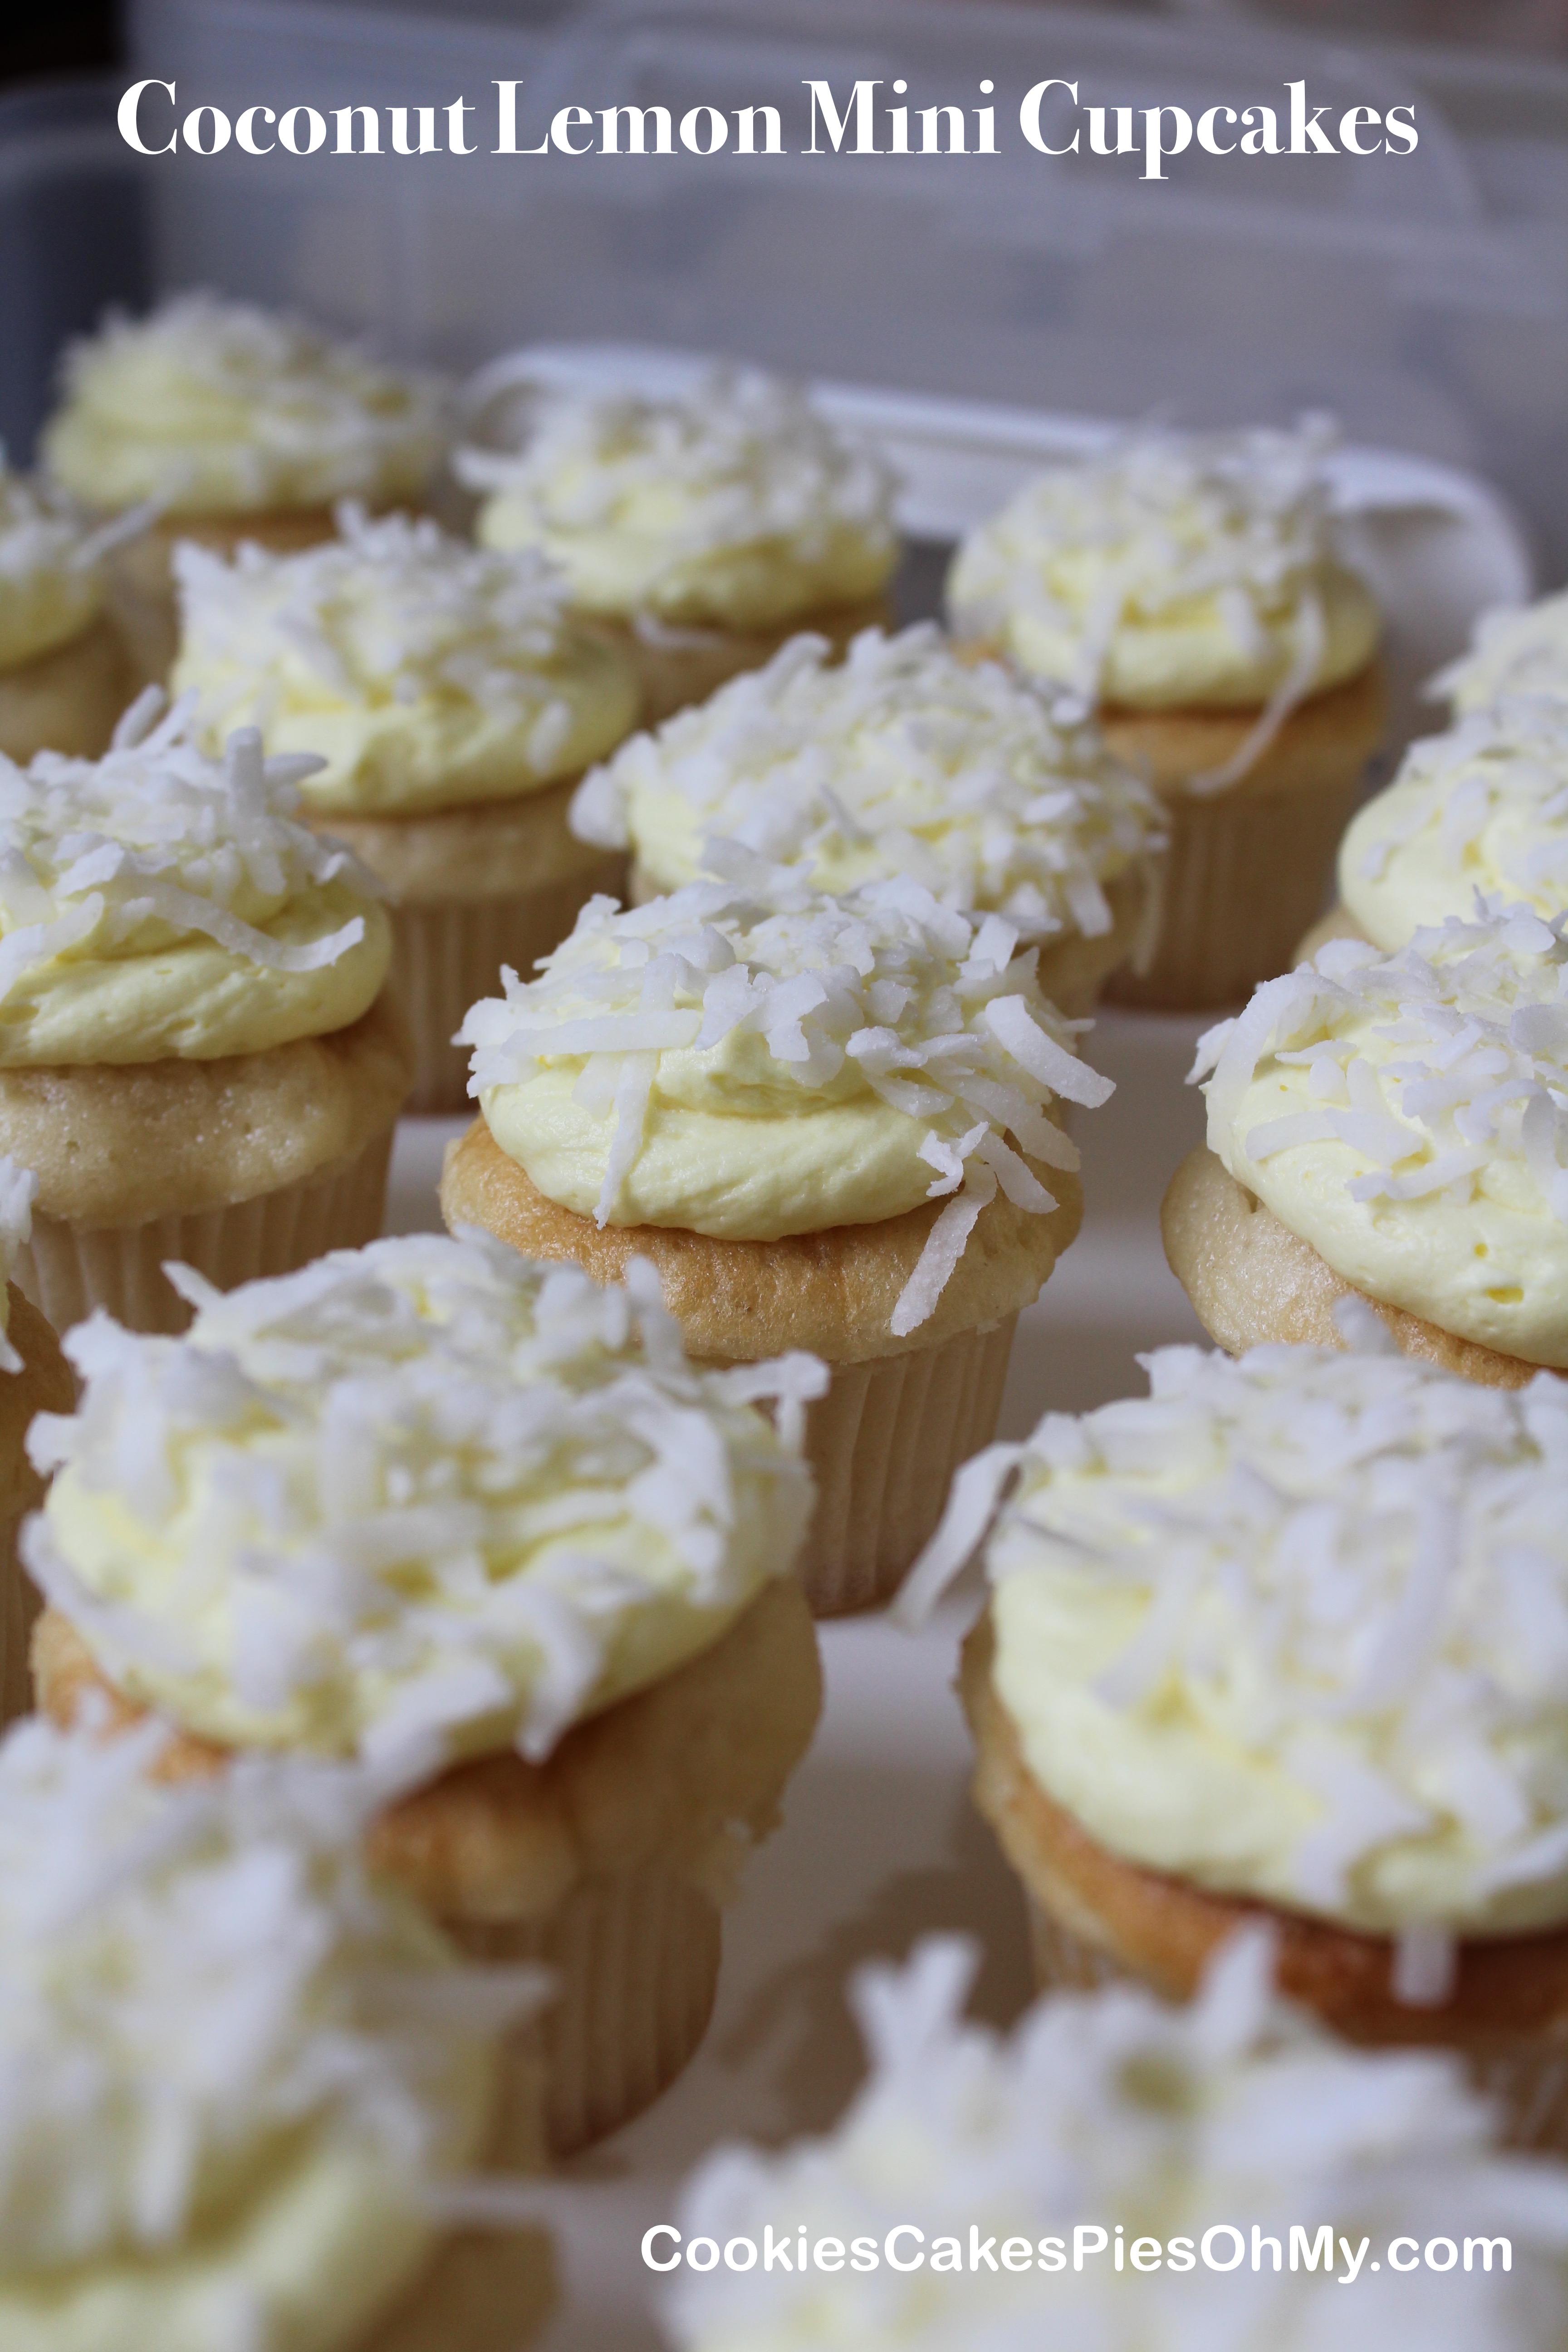 Coconut Lemon Mini Cupcakes